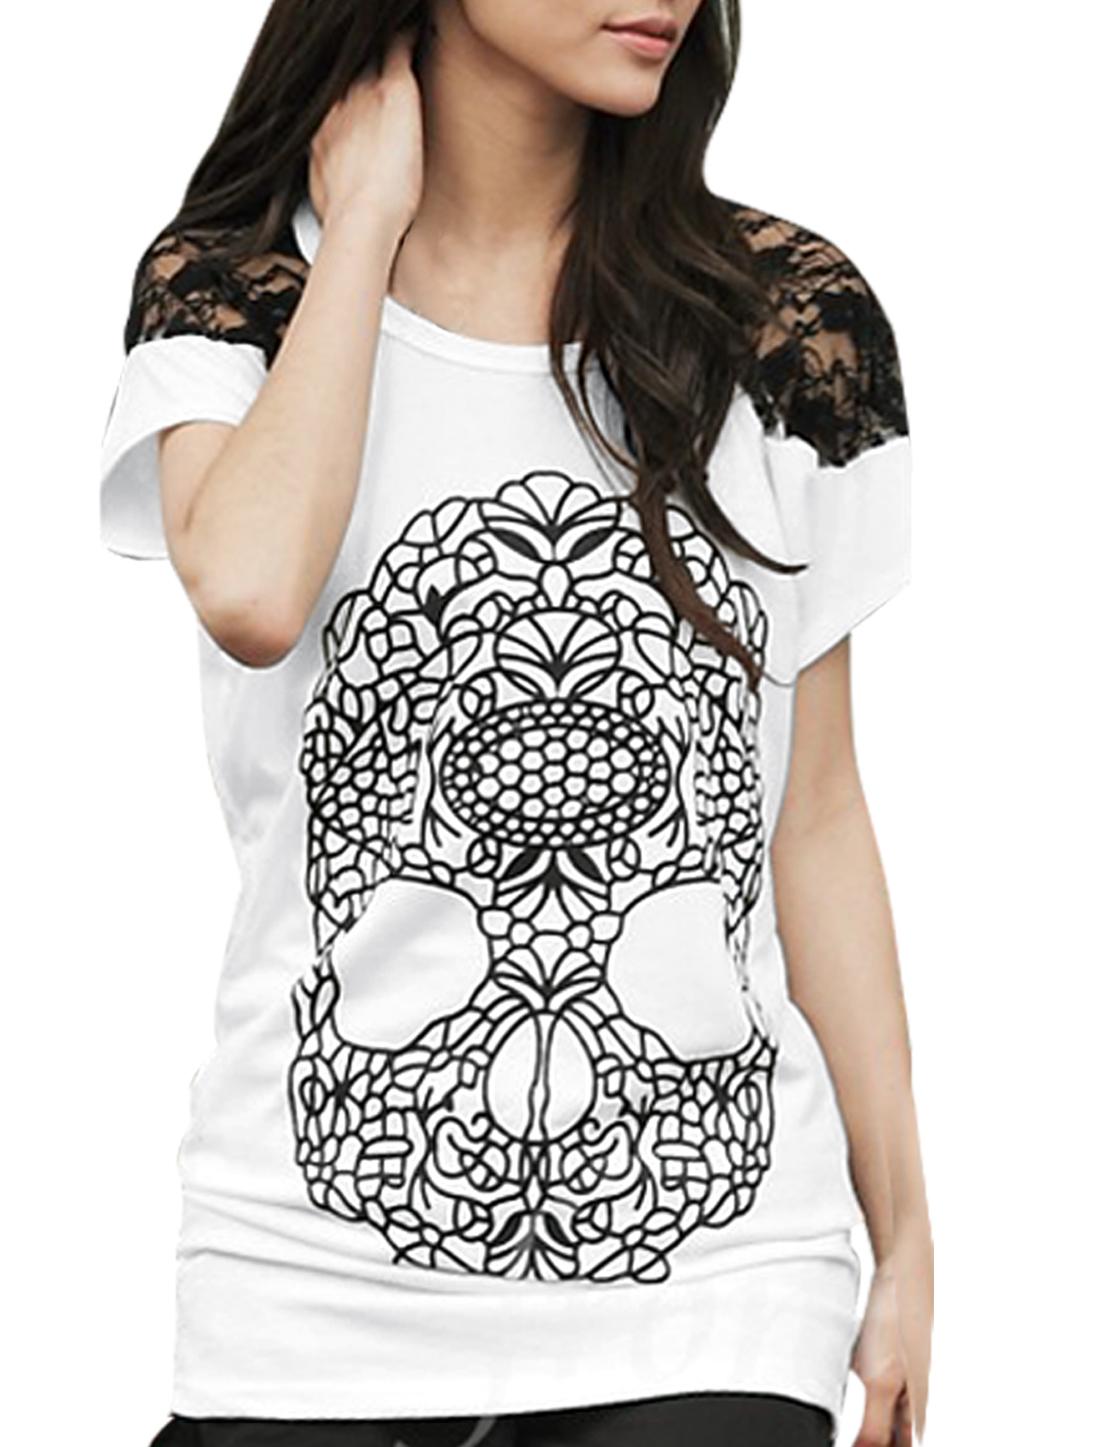 Ladies Chic Scoop Neck Short Raglan Sleeve Lace Panel White T-Shirt XS